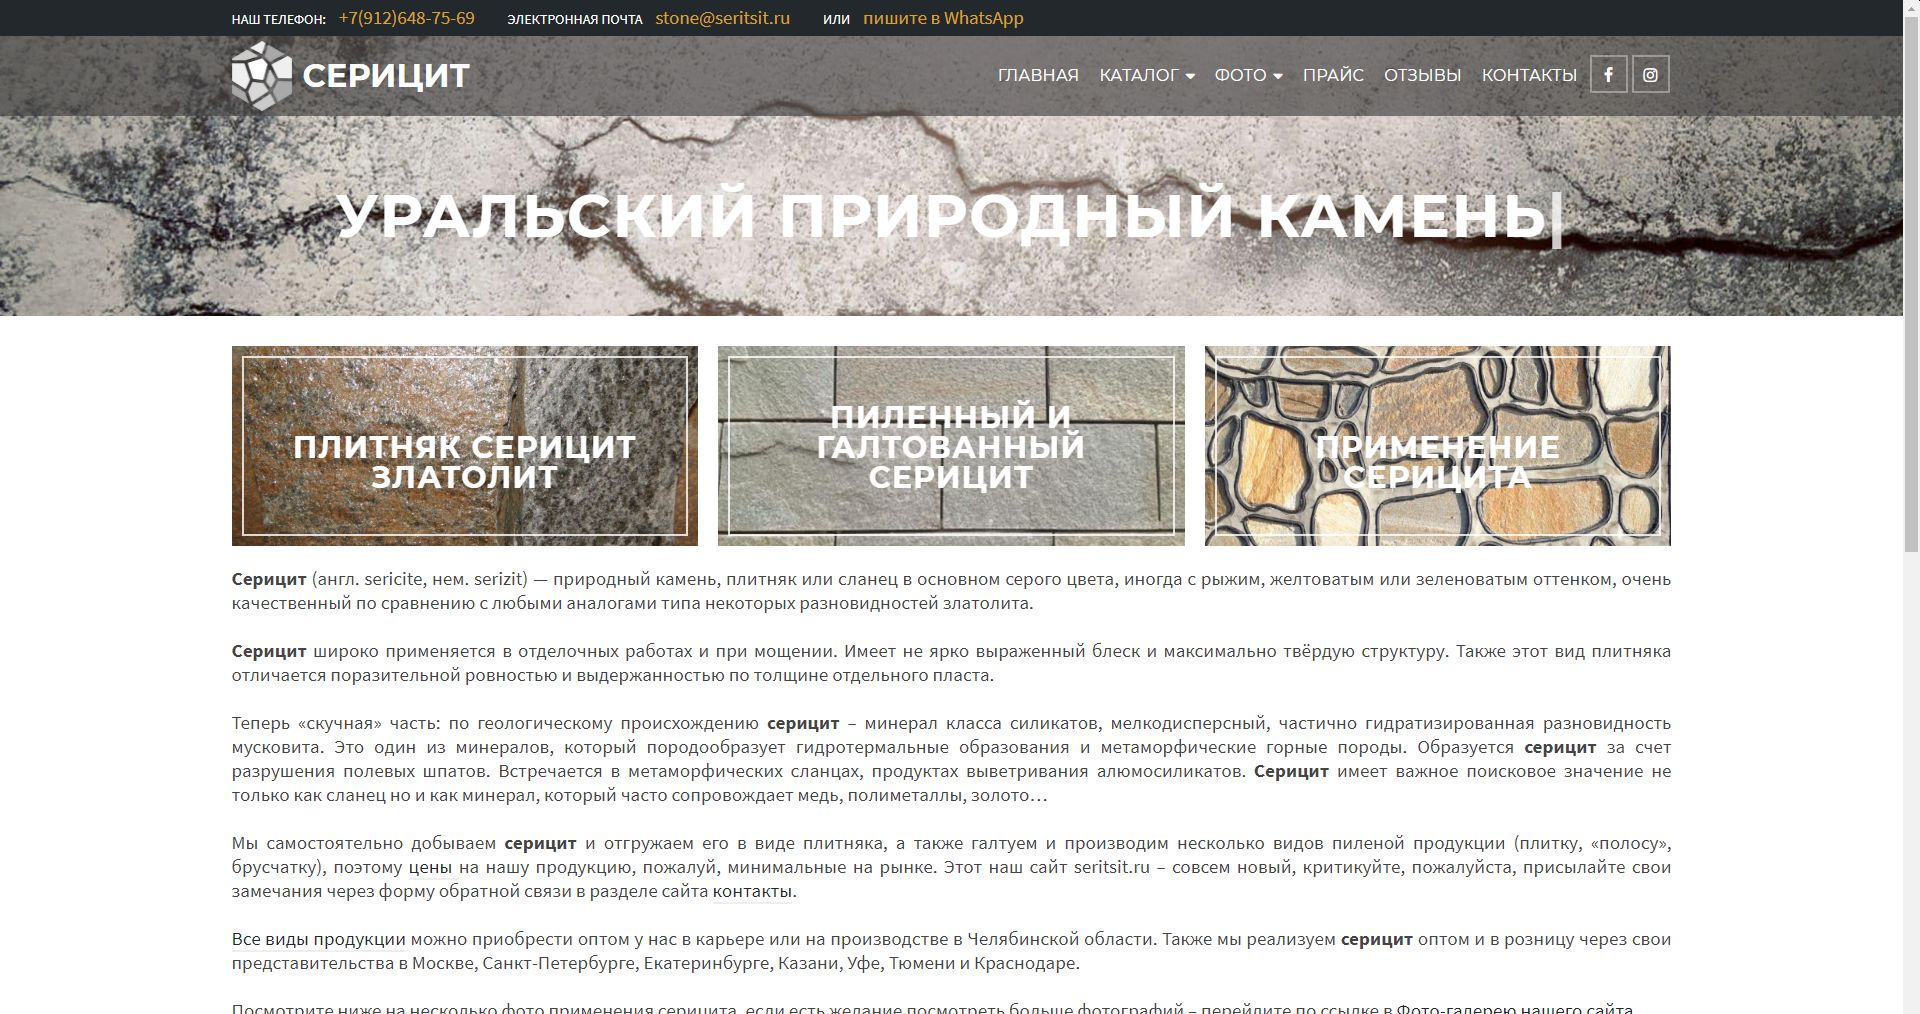 seritsit.ru